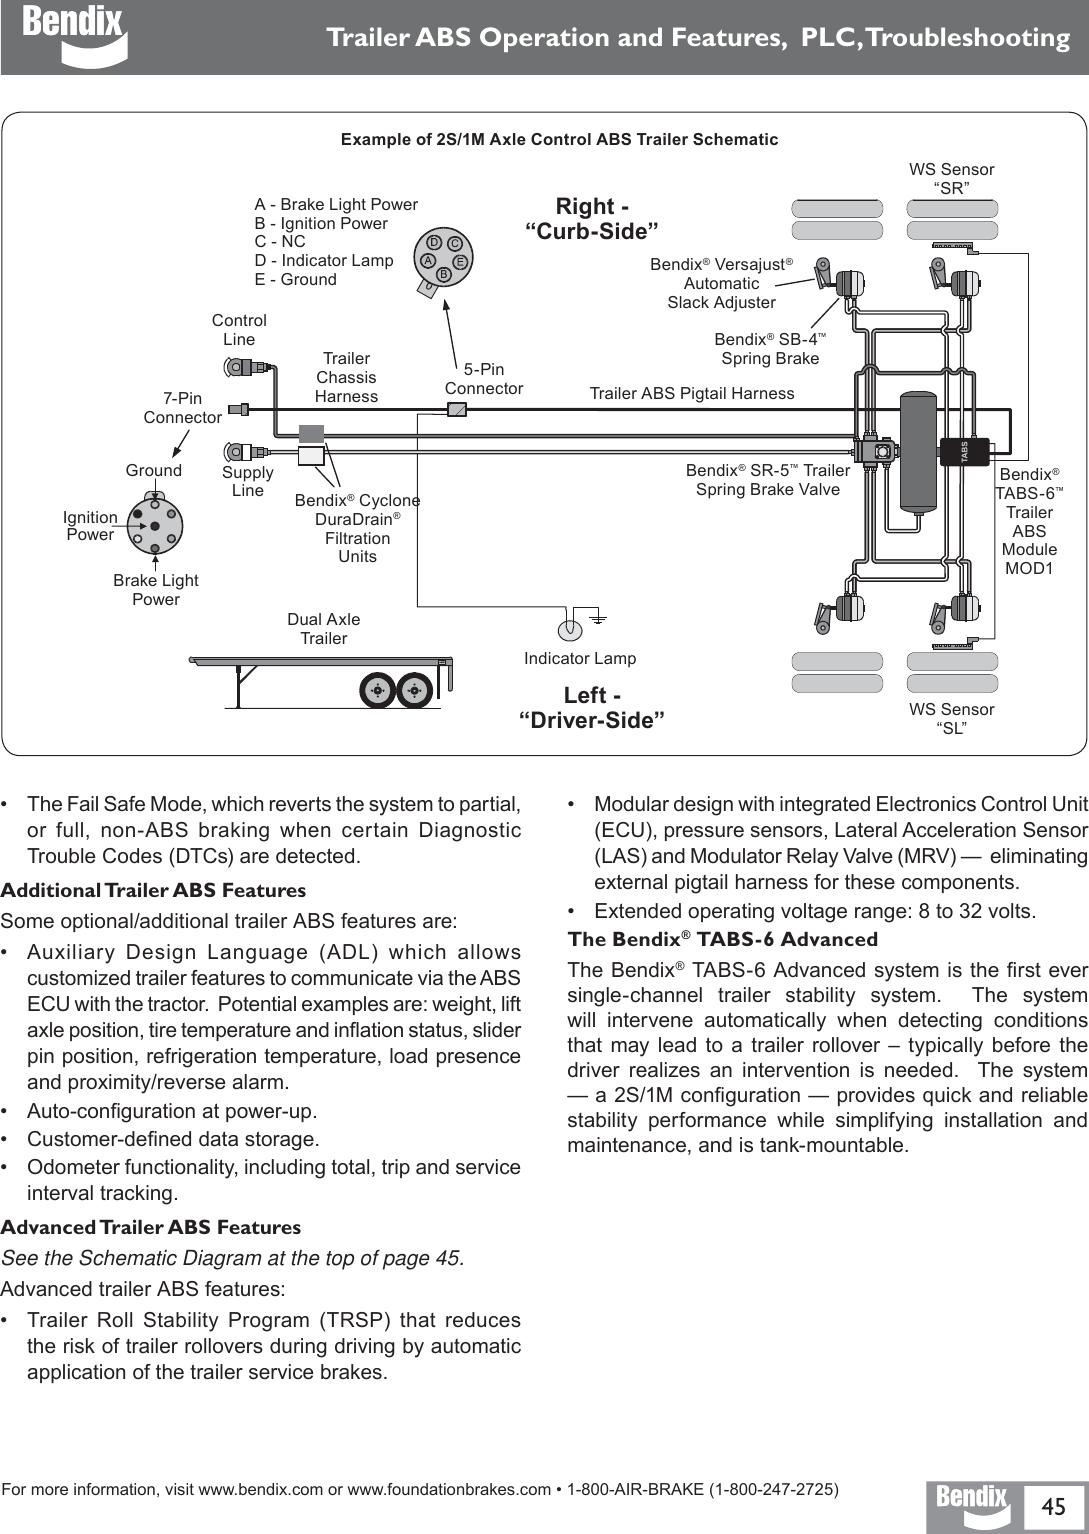 Bendix Bw5057 Users Manual